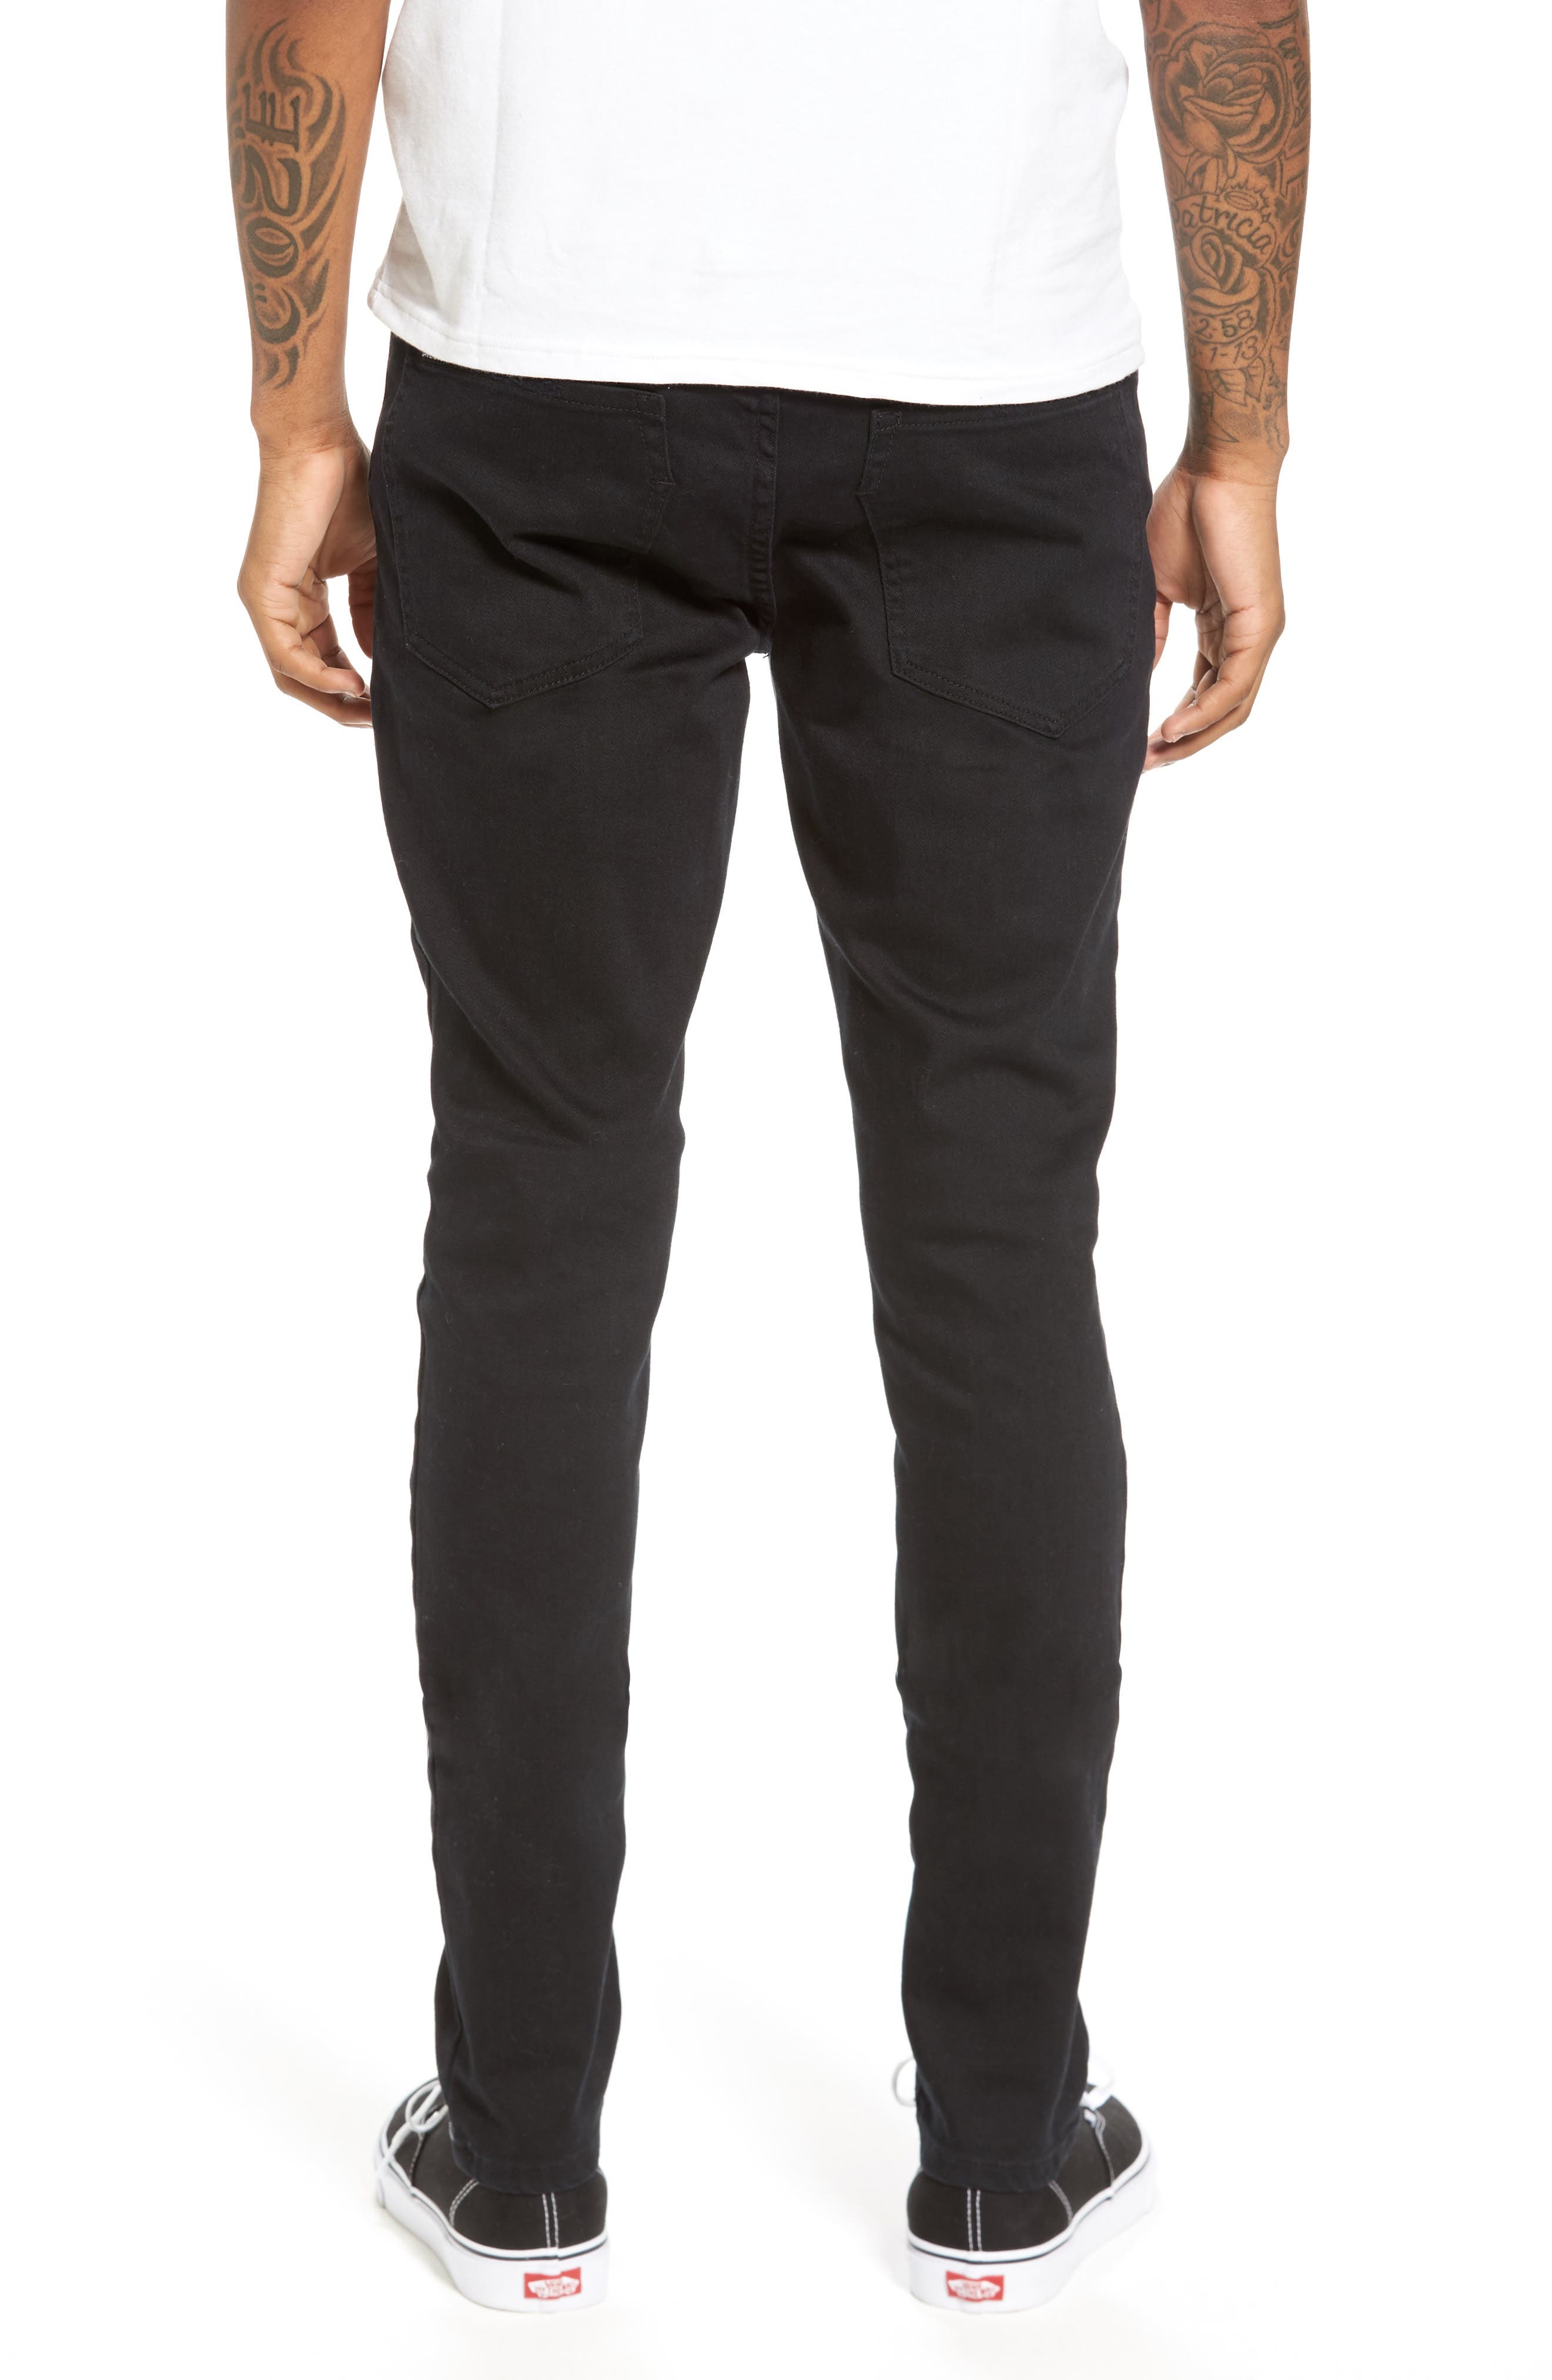 Joe Blow Destroyed Denim Jeans,                             Alternate thumbnail 2, color,                             Black Shred